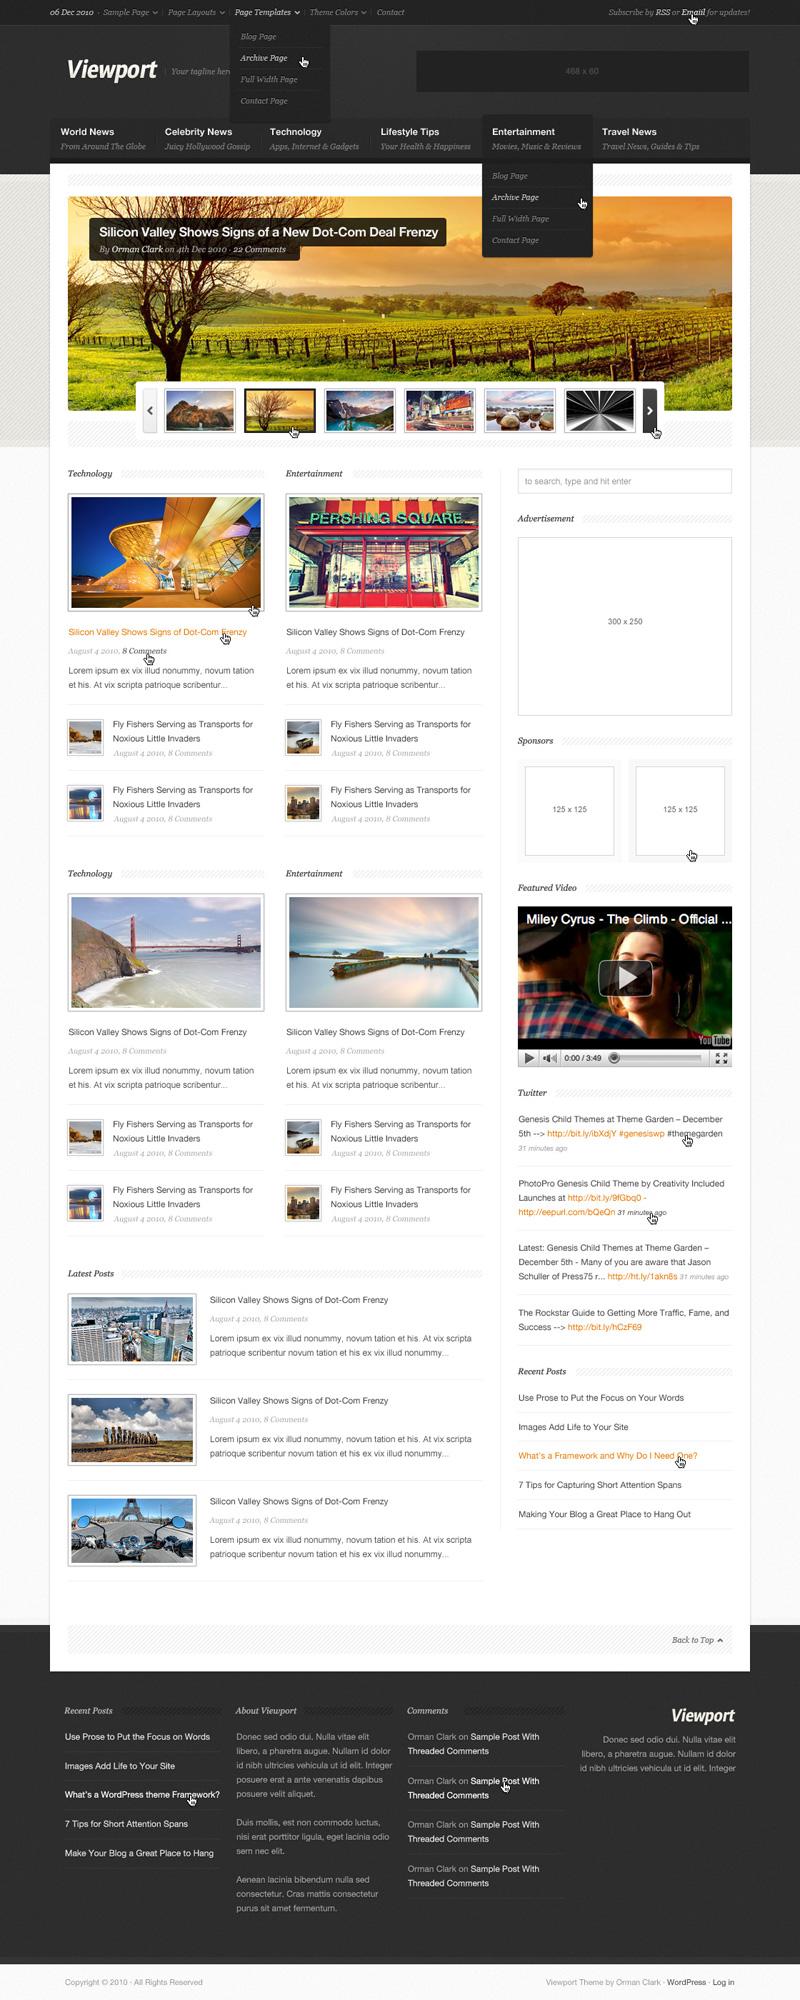 ViewPort: Magazine Site Template (PSD)